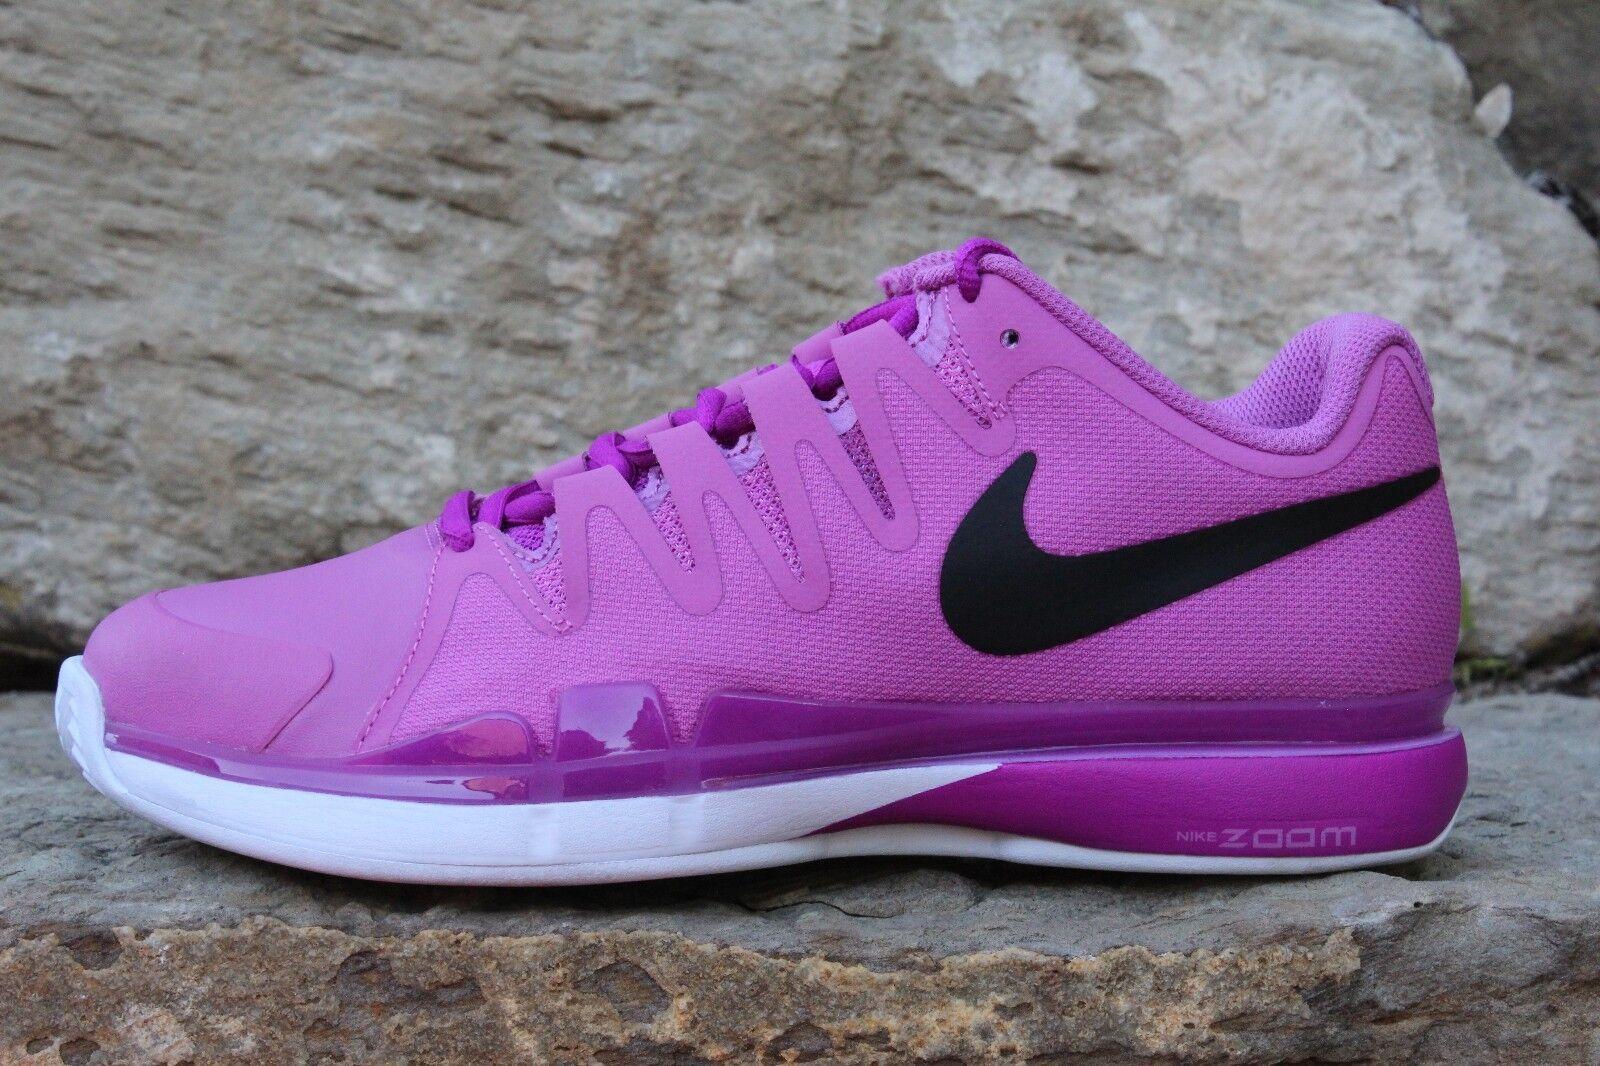 17 New Women's Vapor 9.5 Tour Tennis Shoes Pink Black Clay 649087-505 7.5 9 12